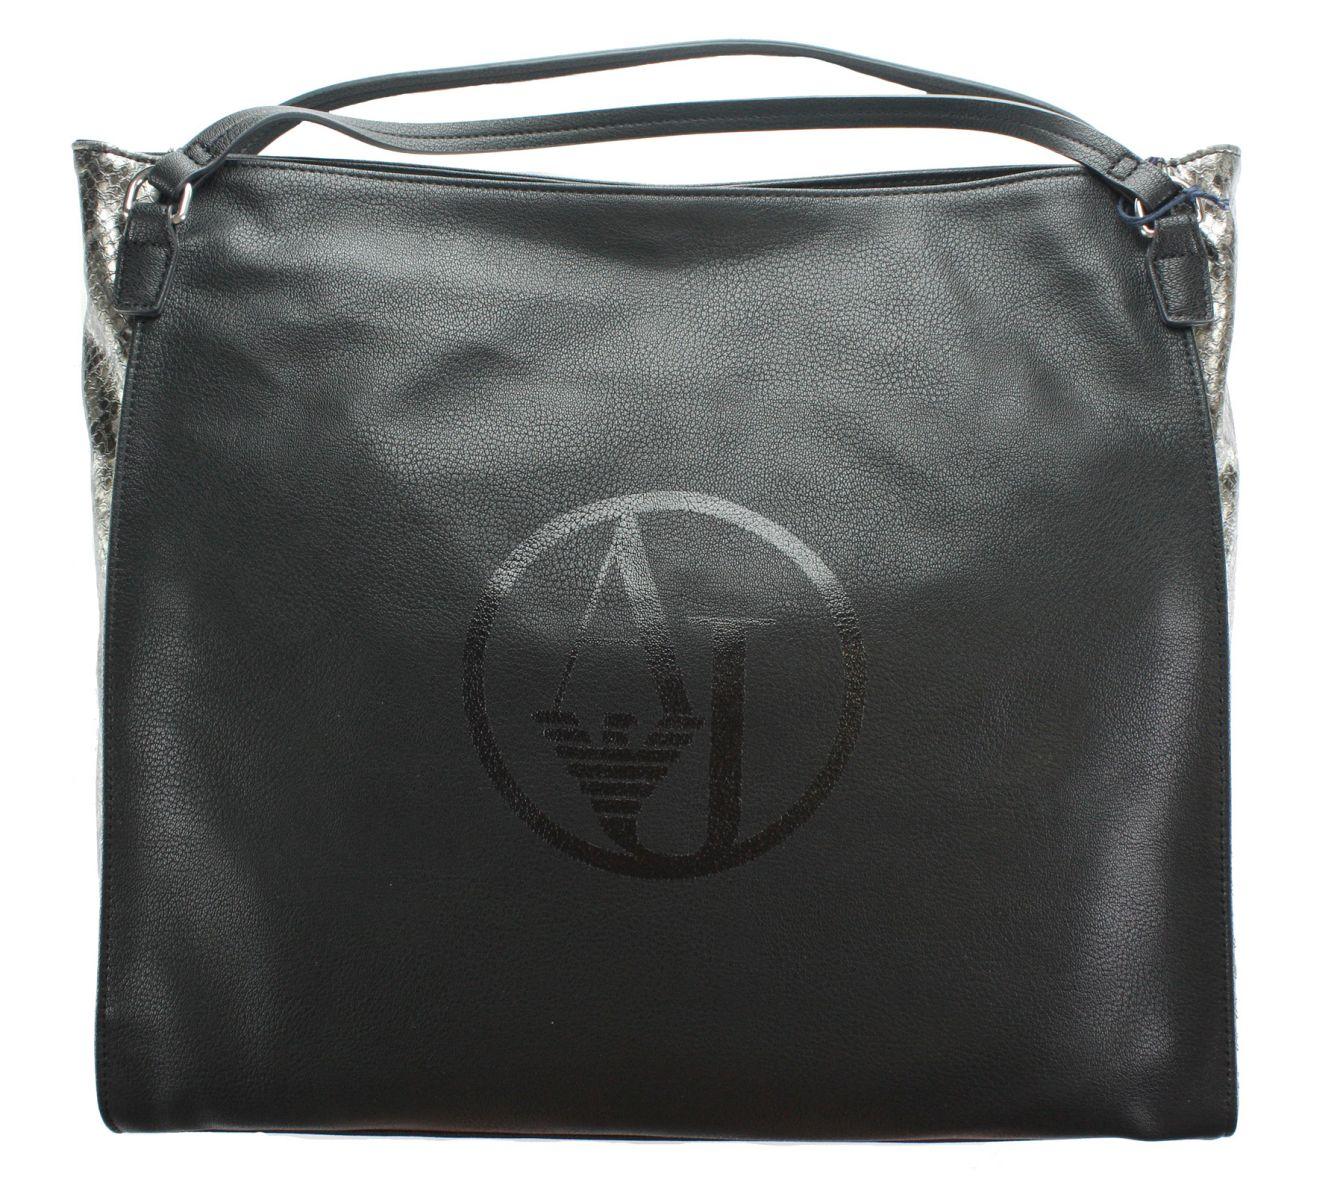 armani jeans damen bag frauen tasche schwarz mod b5251 ebay. Black Bedroom Furniture Sets. Home Design Ideas